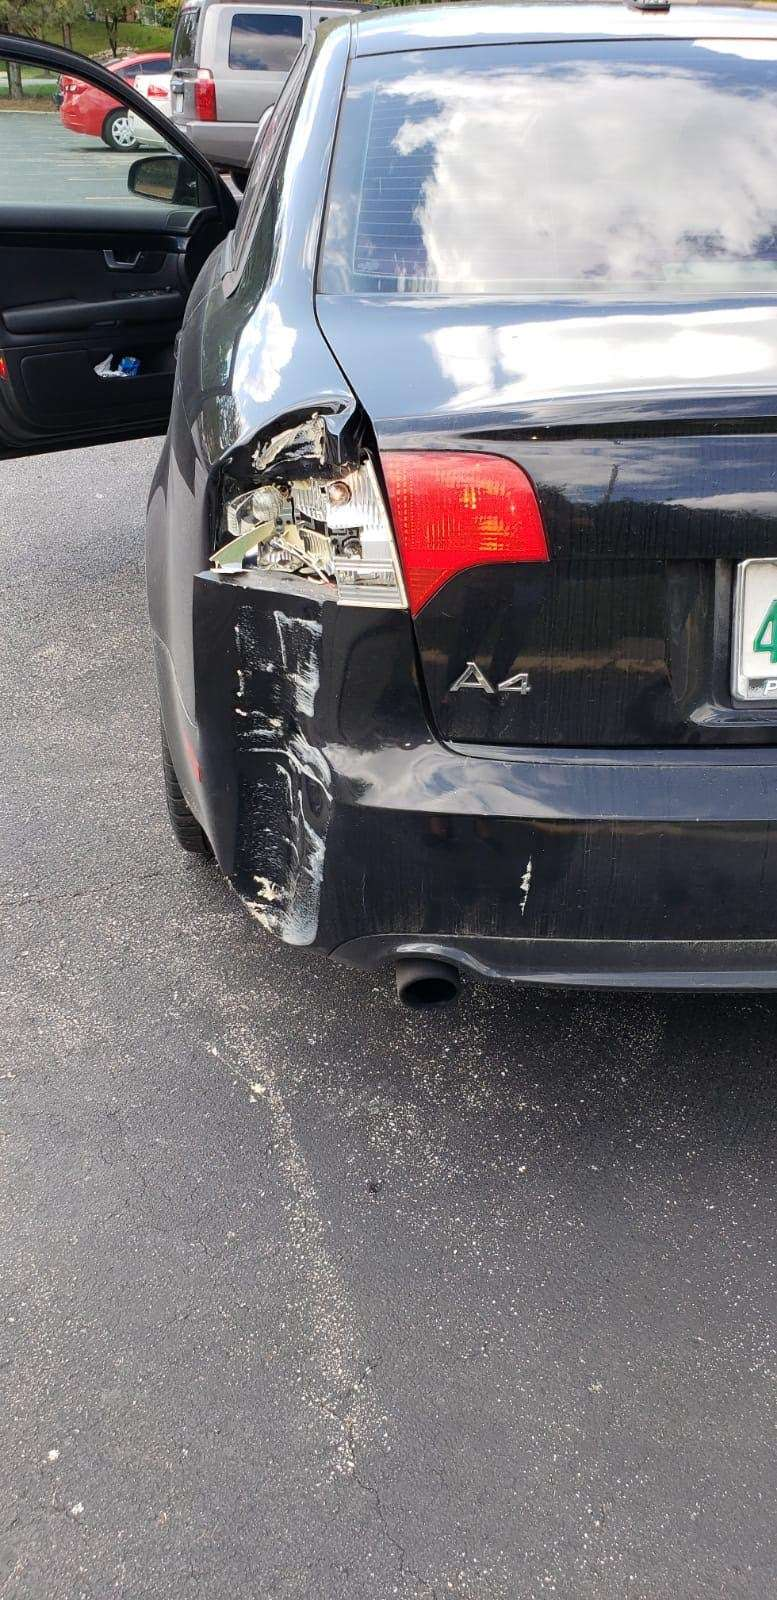 Fredys Body Shop - car repair    Photo 1 of 1   Address: 8017 Prospect Ave, Kansas City, MO 64132, USA   Phone: (816) 361-1363